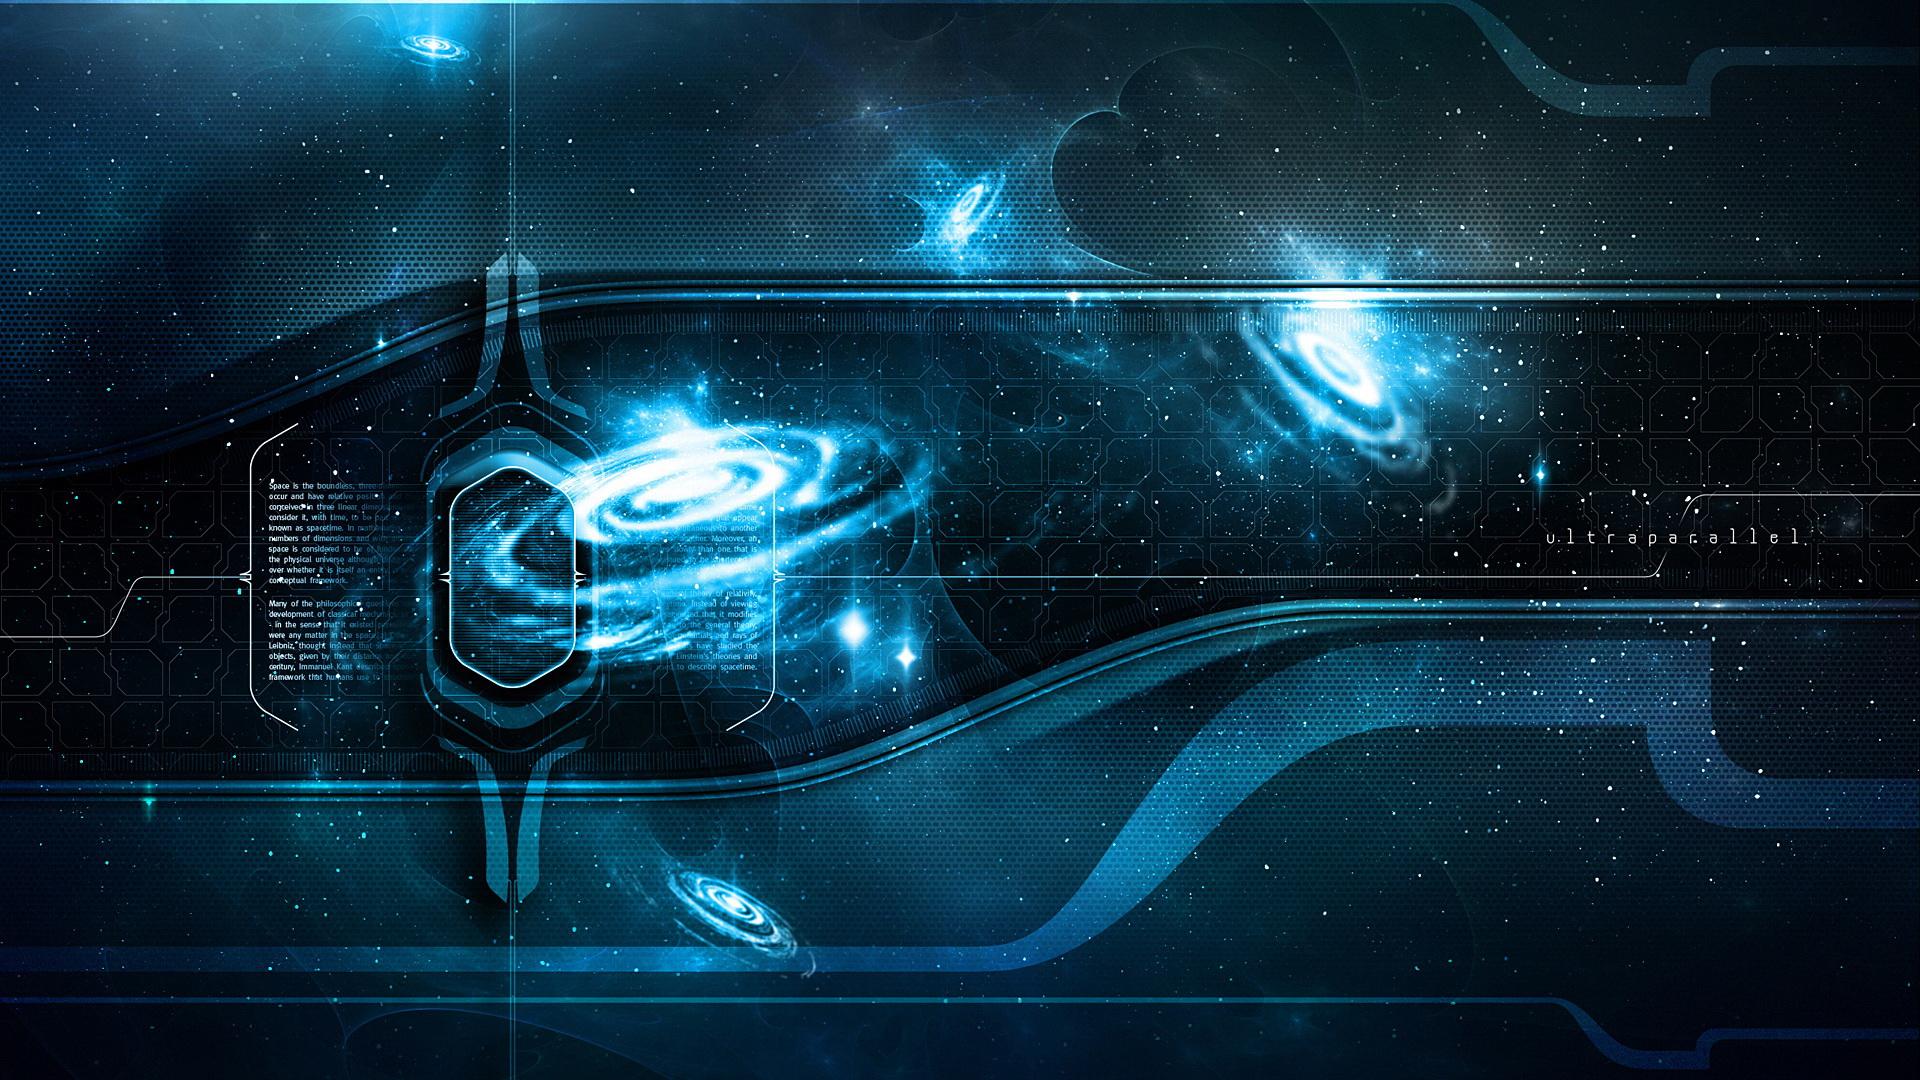 HD Desktop Technology Wallpaper Backgrounds For Download 1920x1080